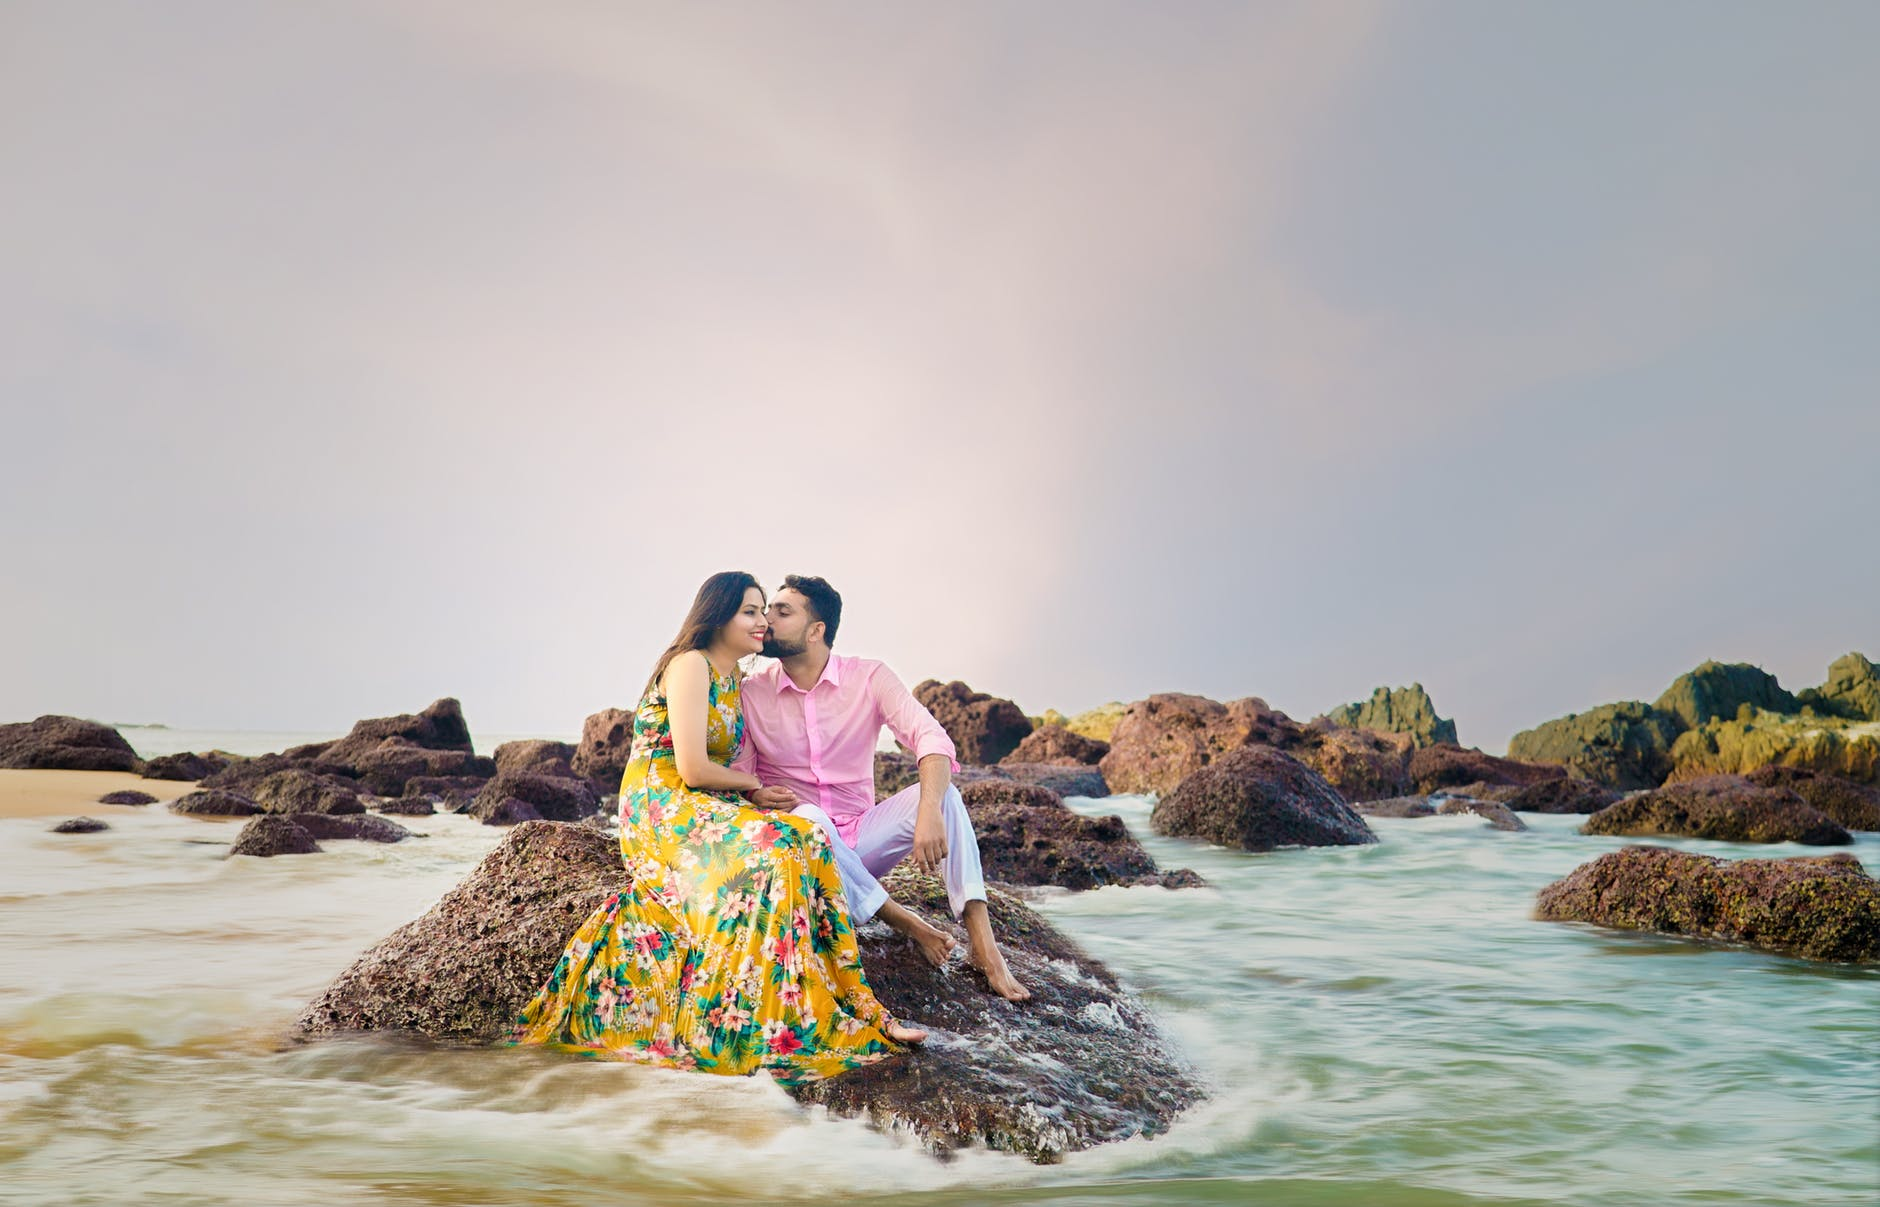 Unique Pre Wedding Photoshoot Destinations With Unexplora